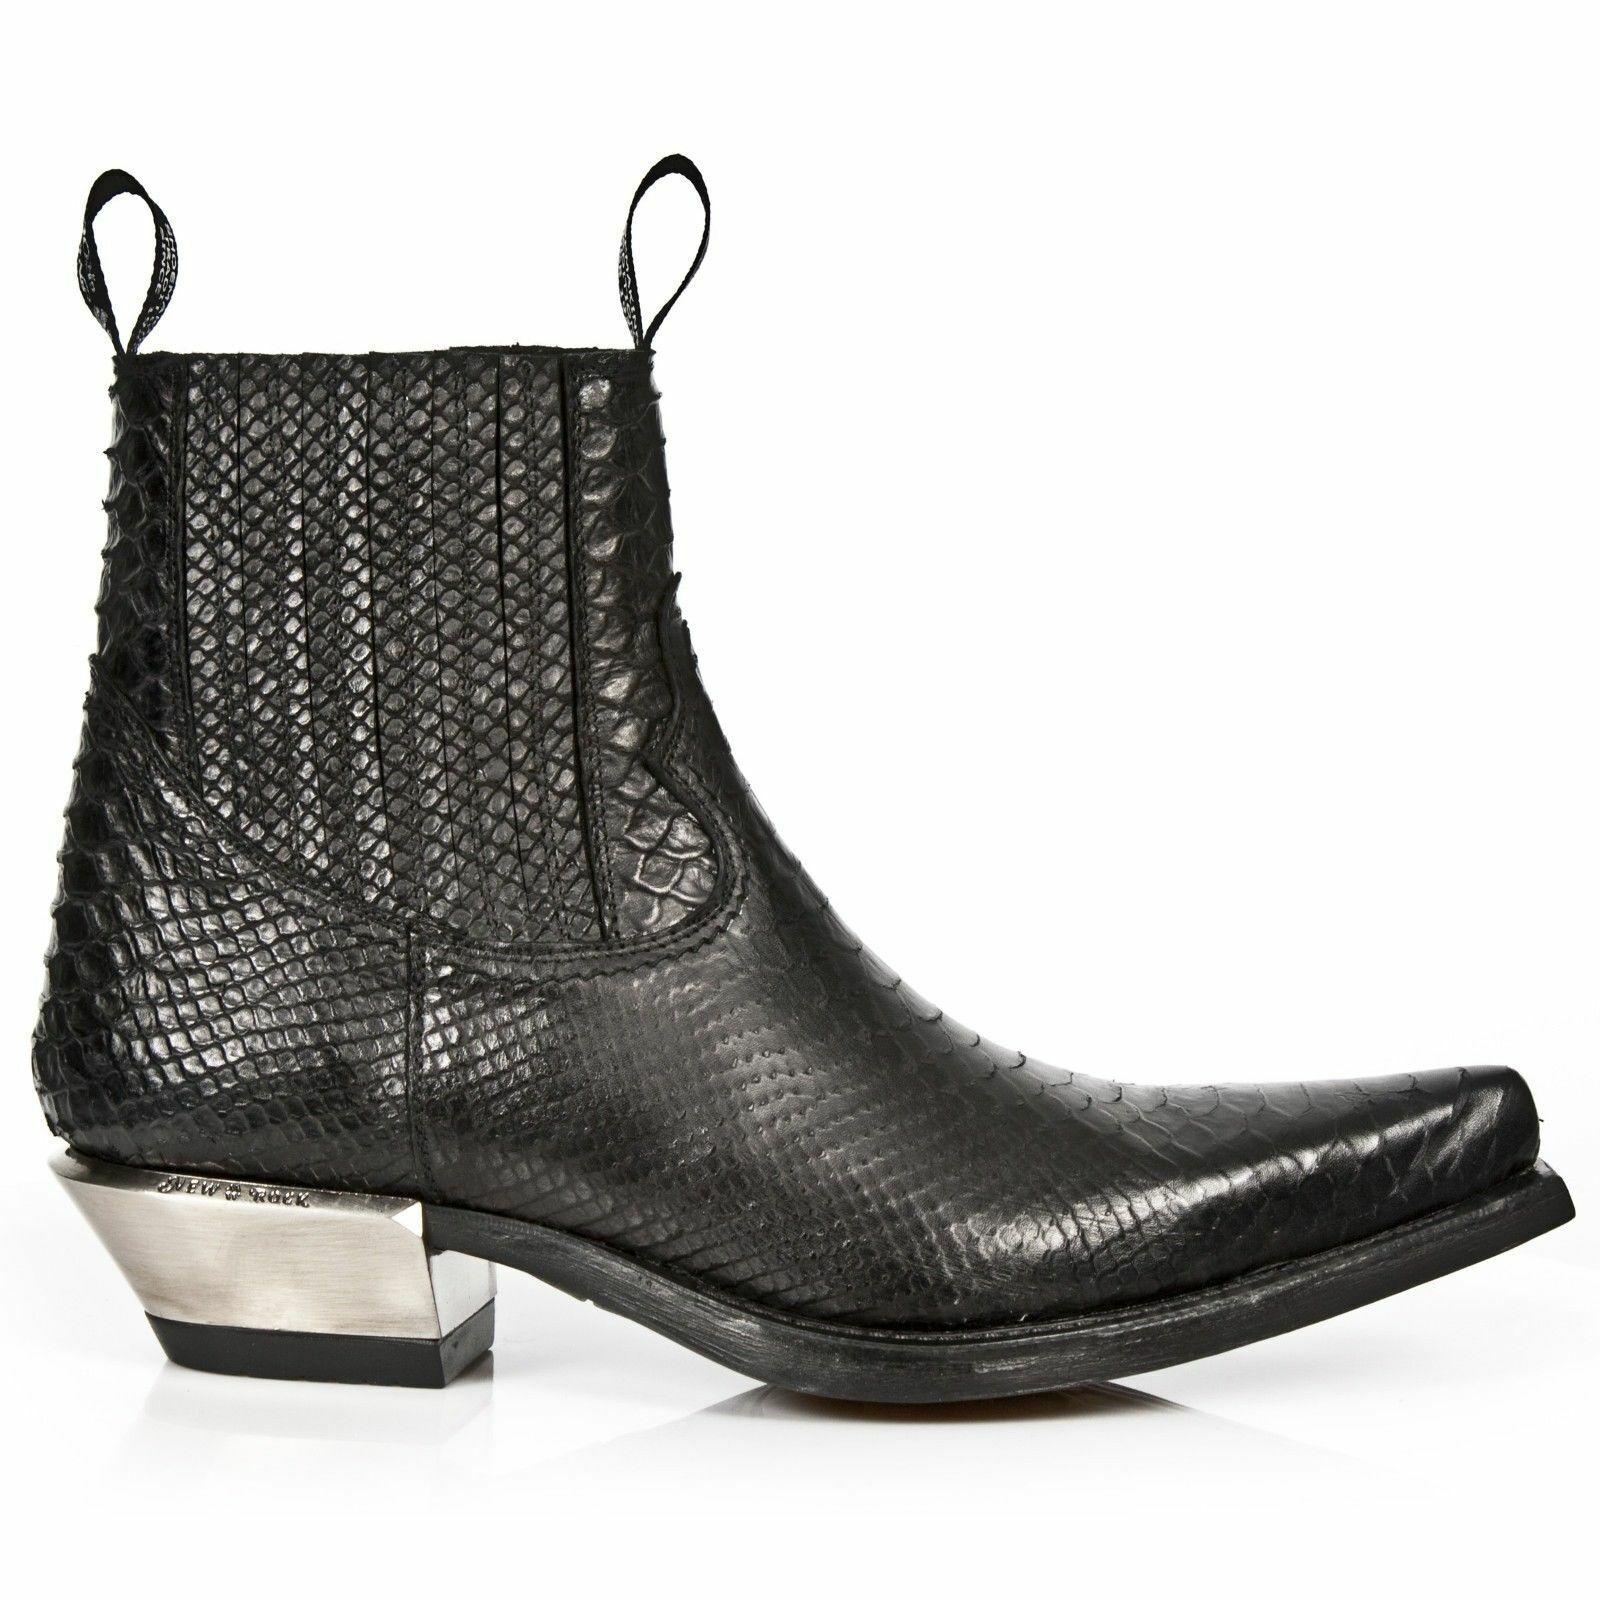 New Rock Rock Rock M.7953-S4 Black Python Print Leather West Steel Heel Ankle shoes 4ce8ab